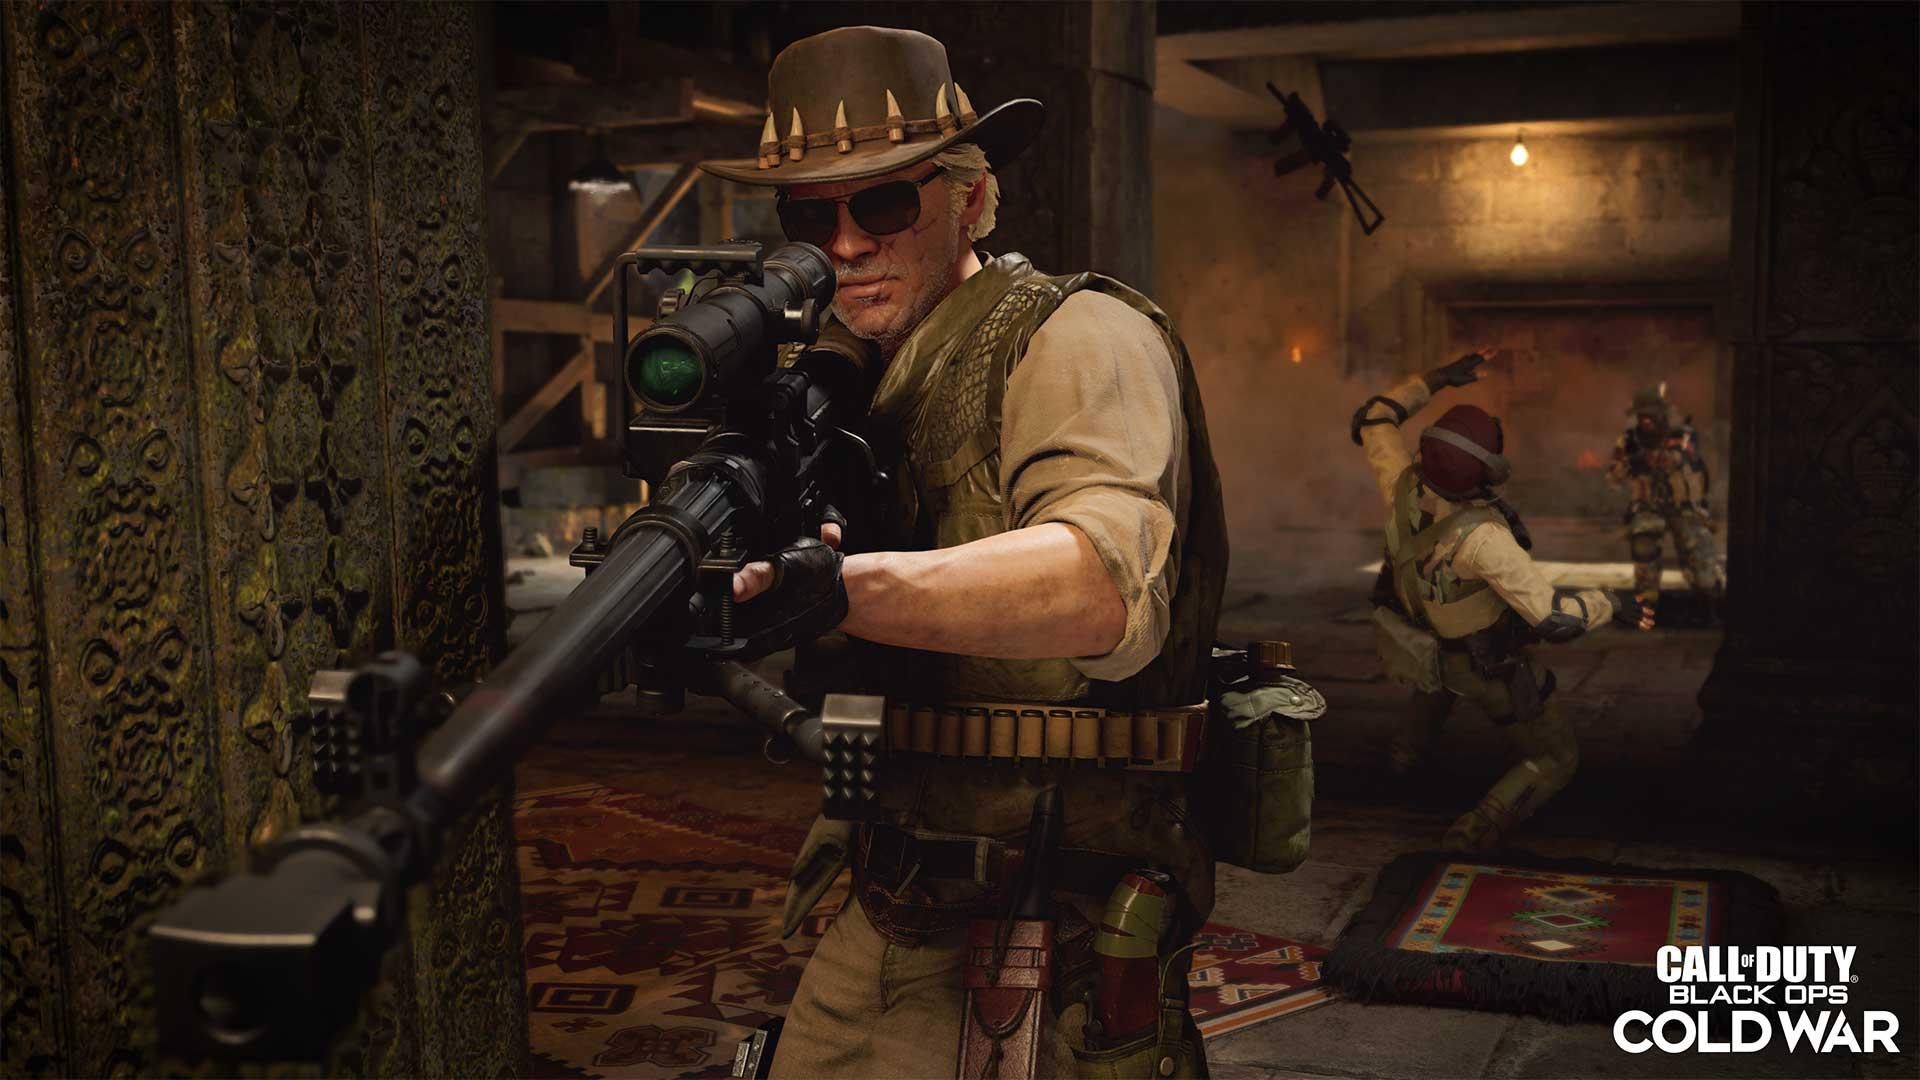 Warzone, Modern Warfare и Black Ops Cold War уже не влезают на диск в 500 ГБ стандартной PS4